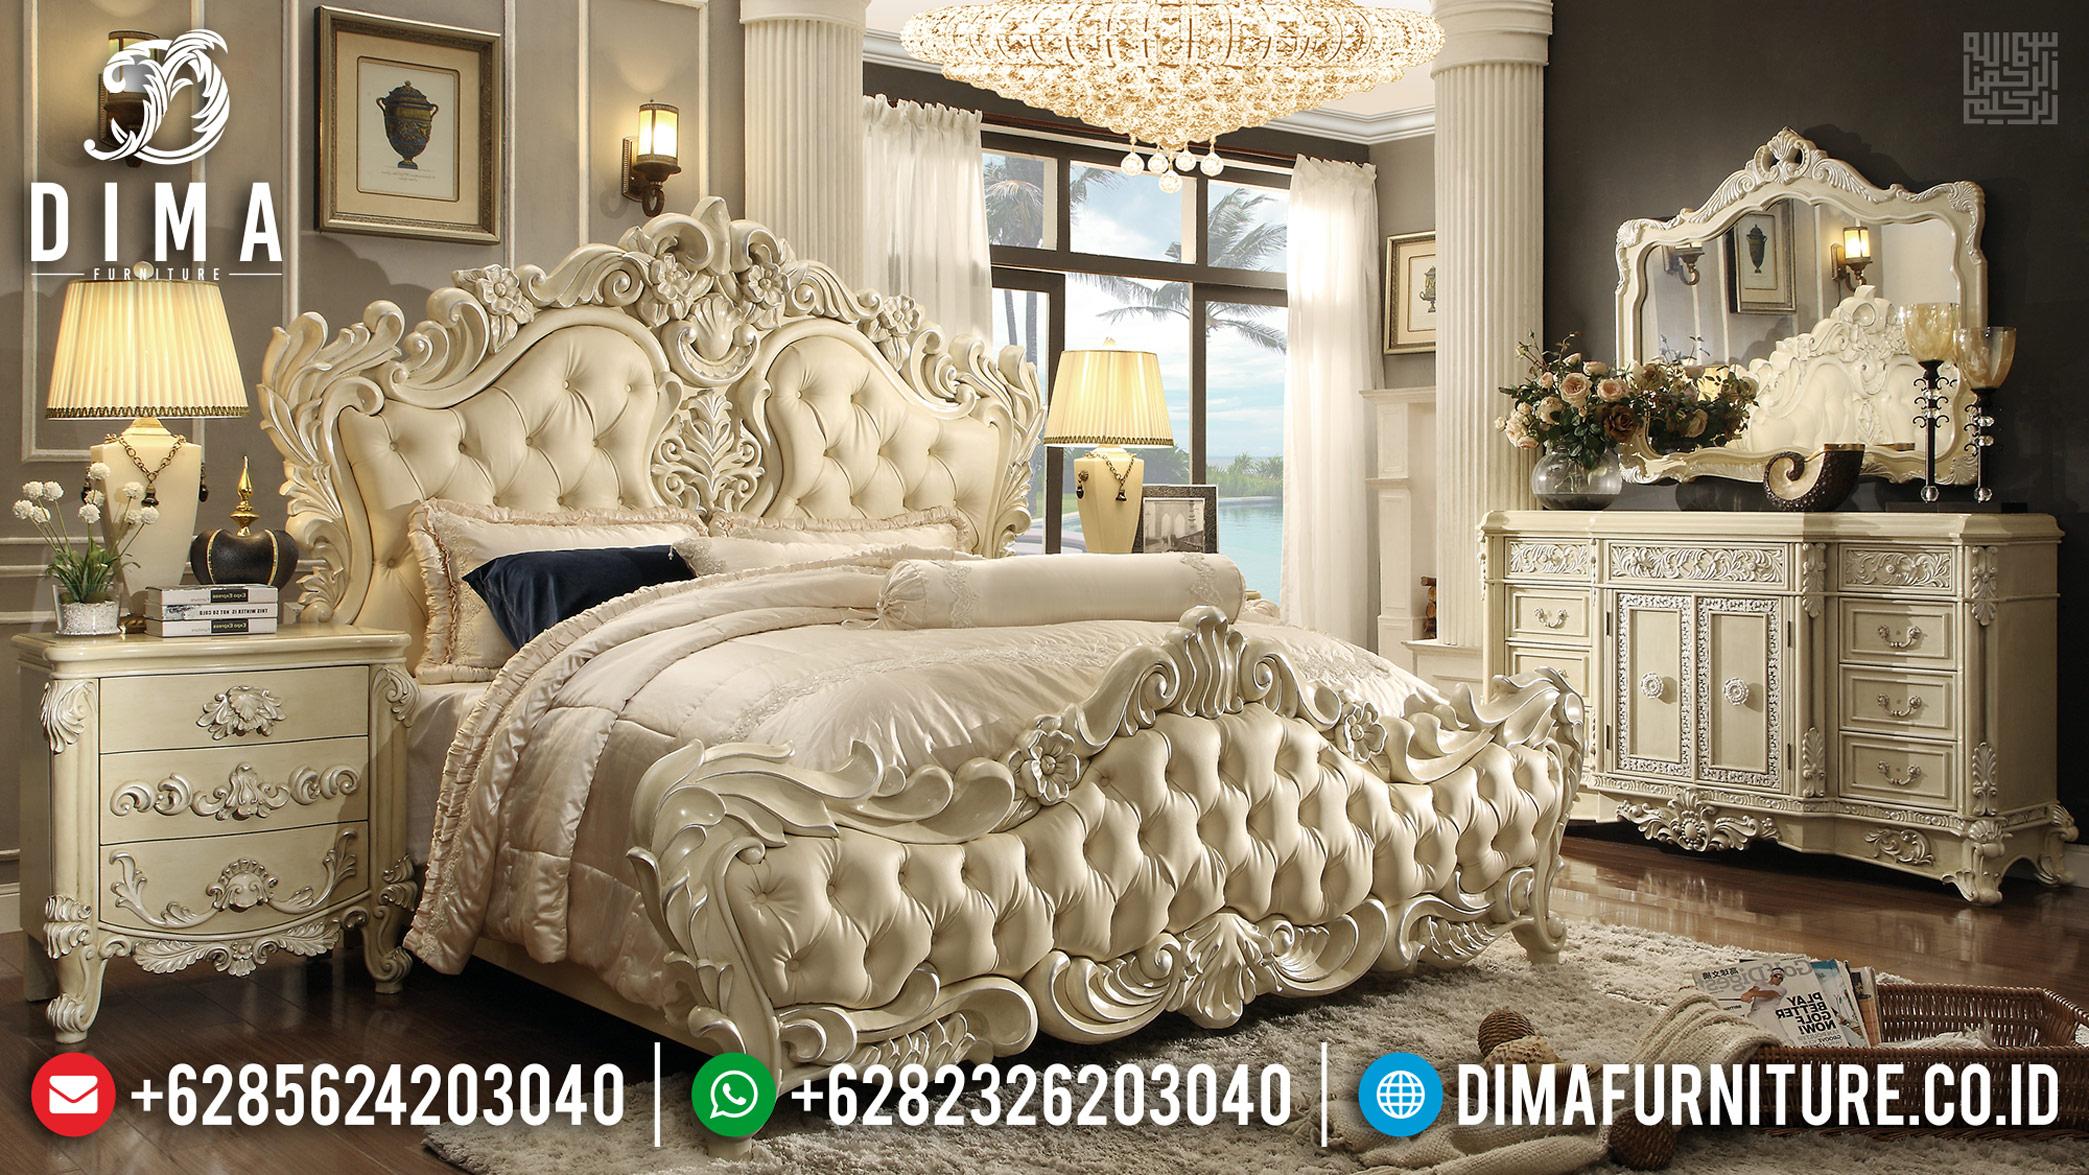 Jual Tempat Tidur Mewah Ukiran Jepara, Kamar Set Mewah Superior LuxuryTTJ-0327